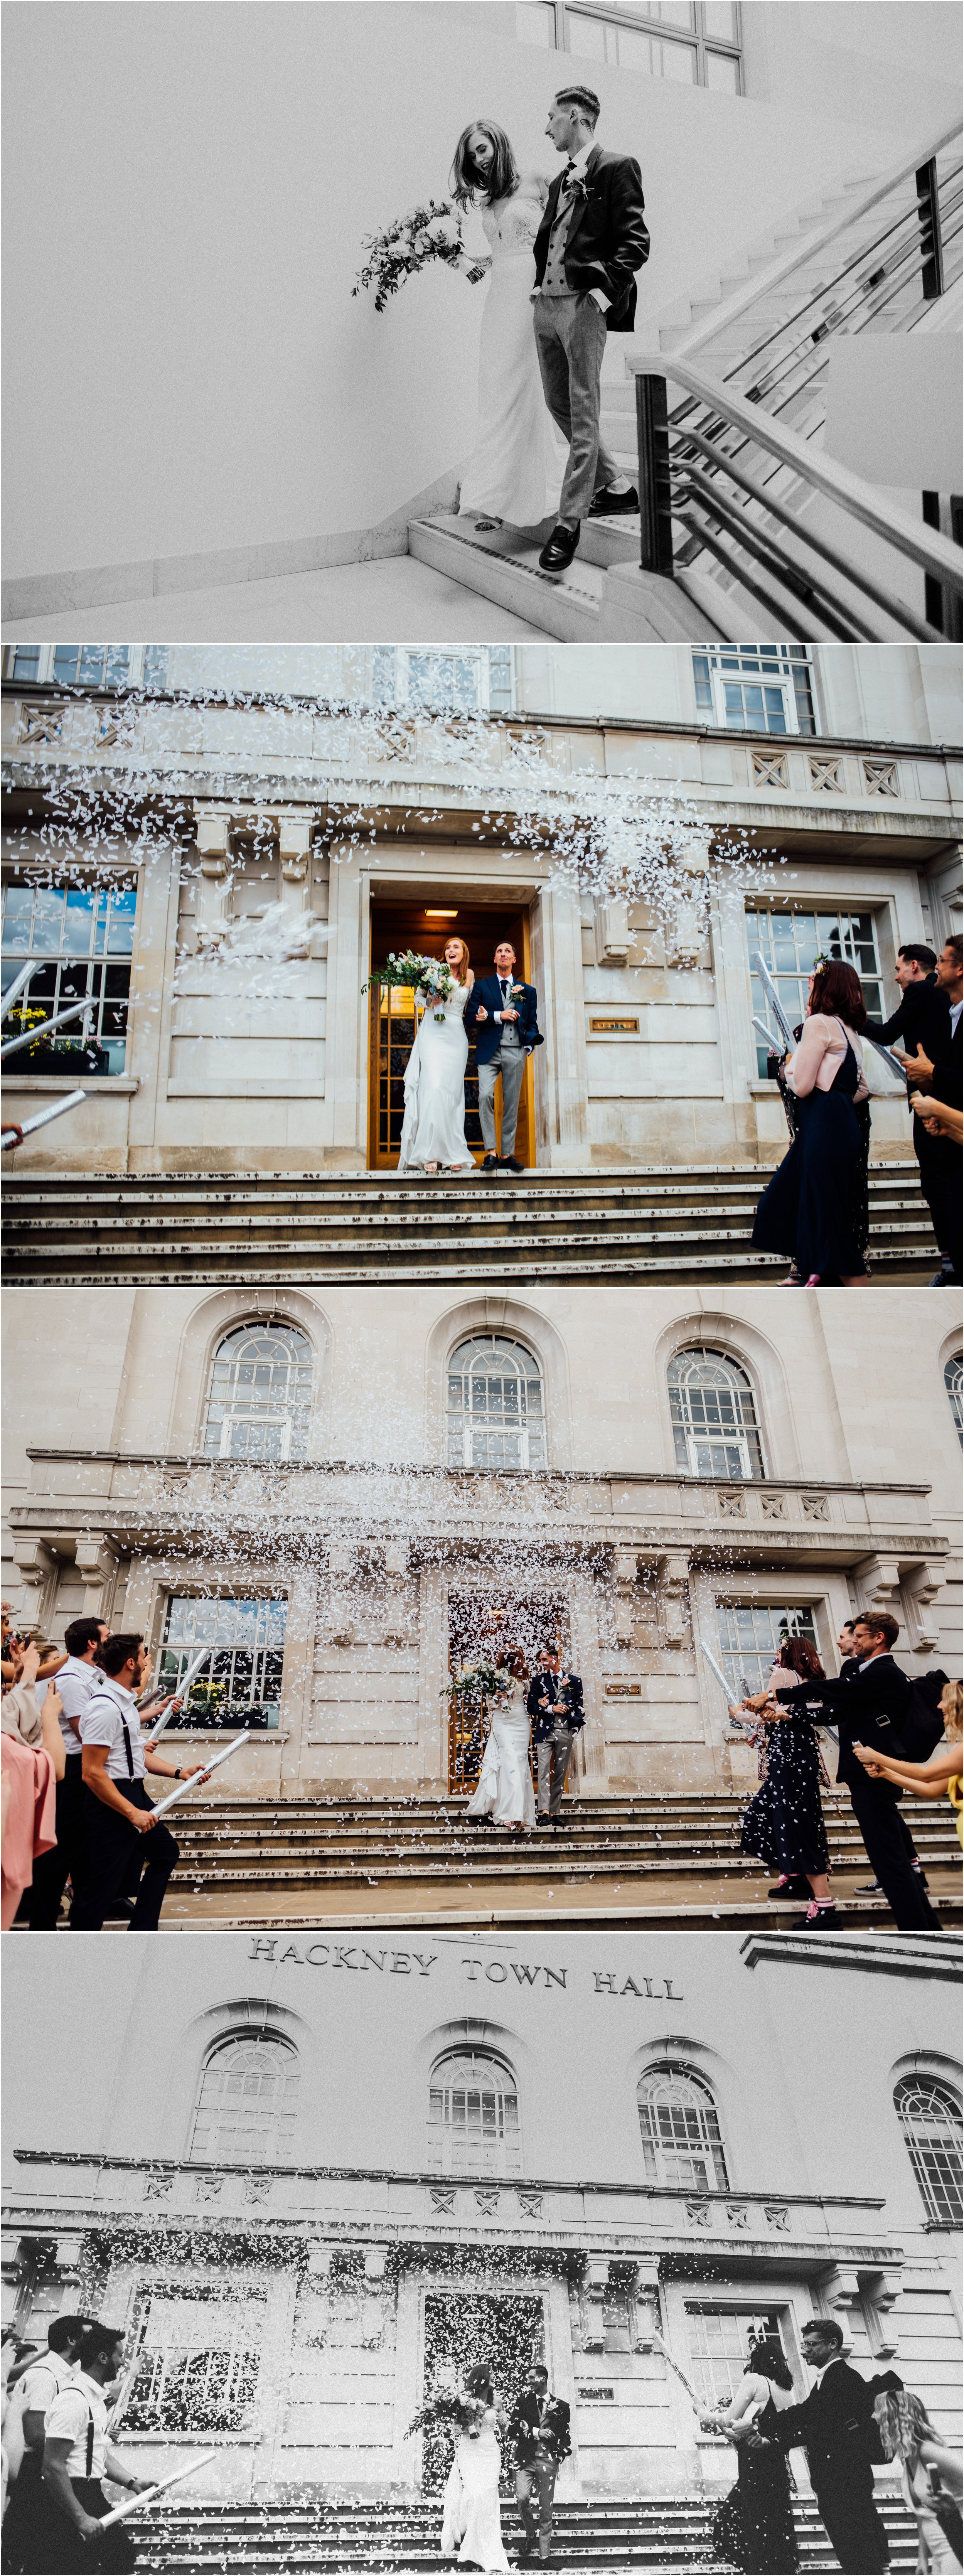 Hackney town hall wedding photography_0072.jpg